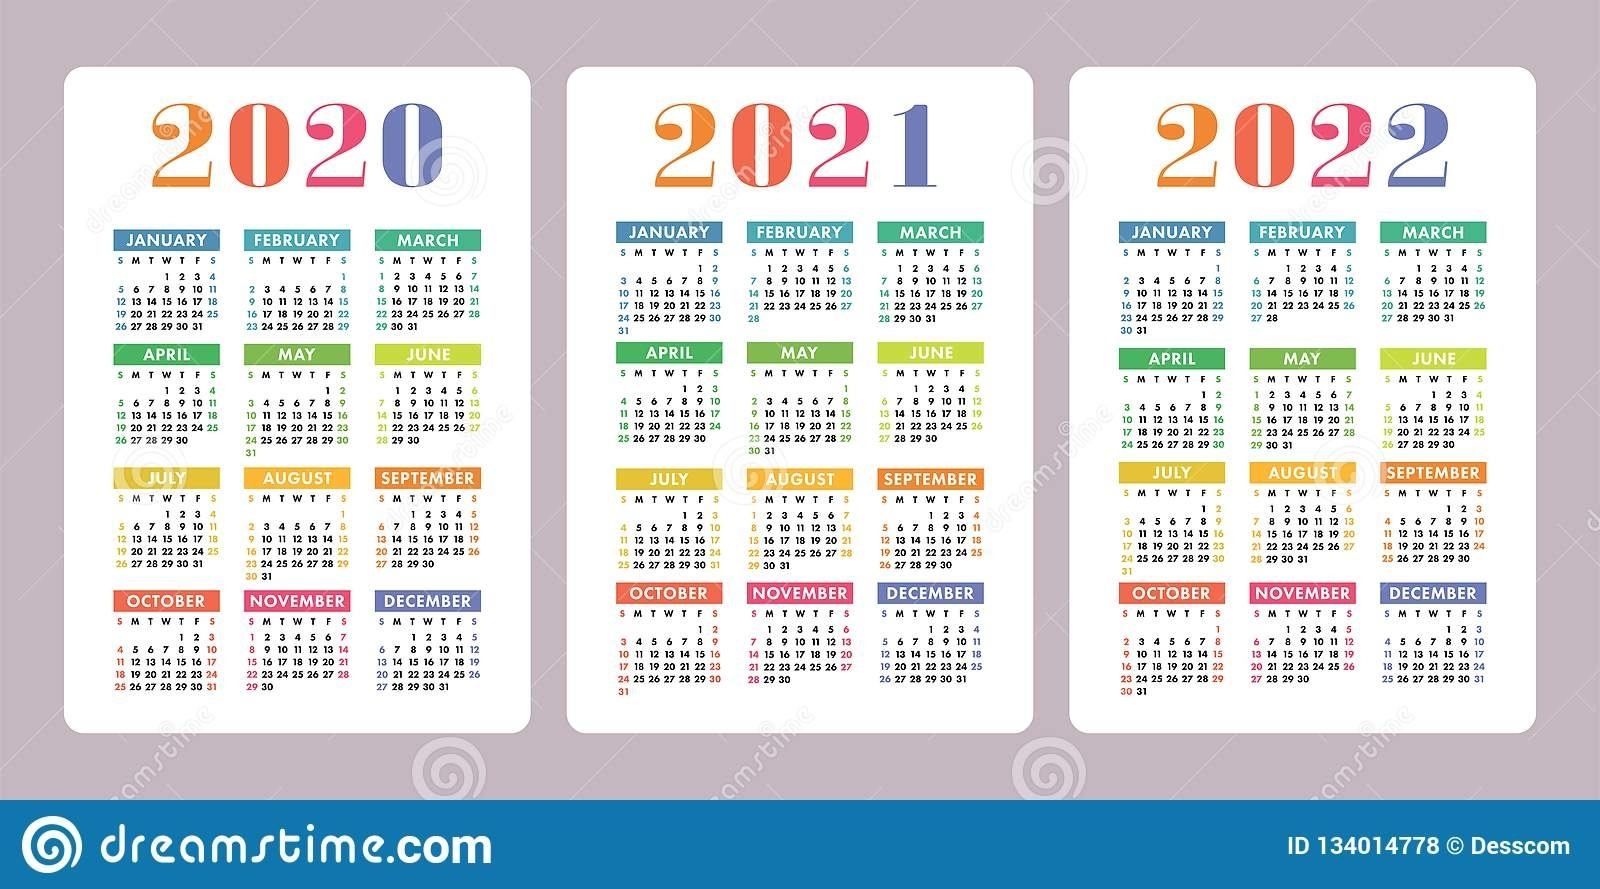 2021 2022 2023 Thrre Year Calendar Ireland | Ten Free